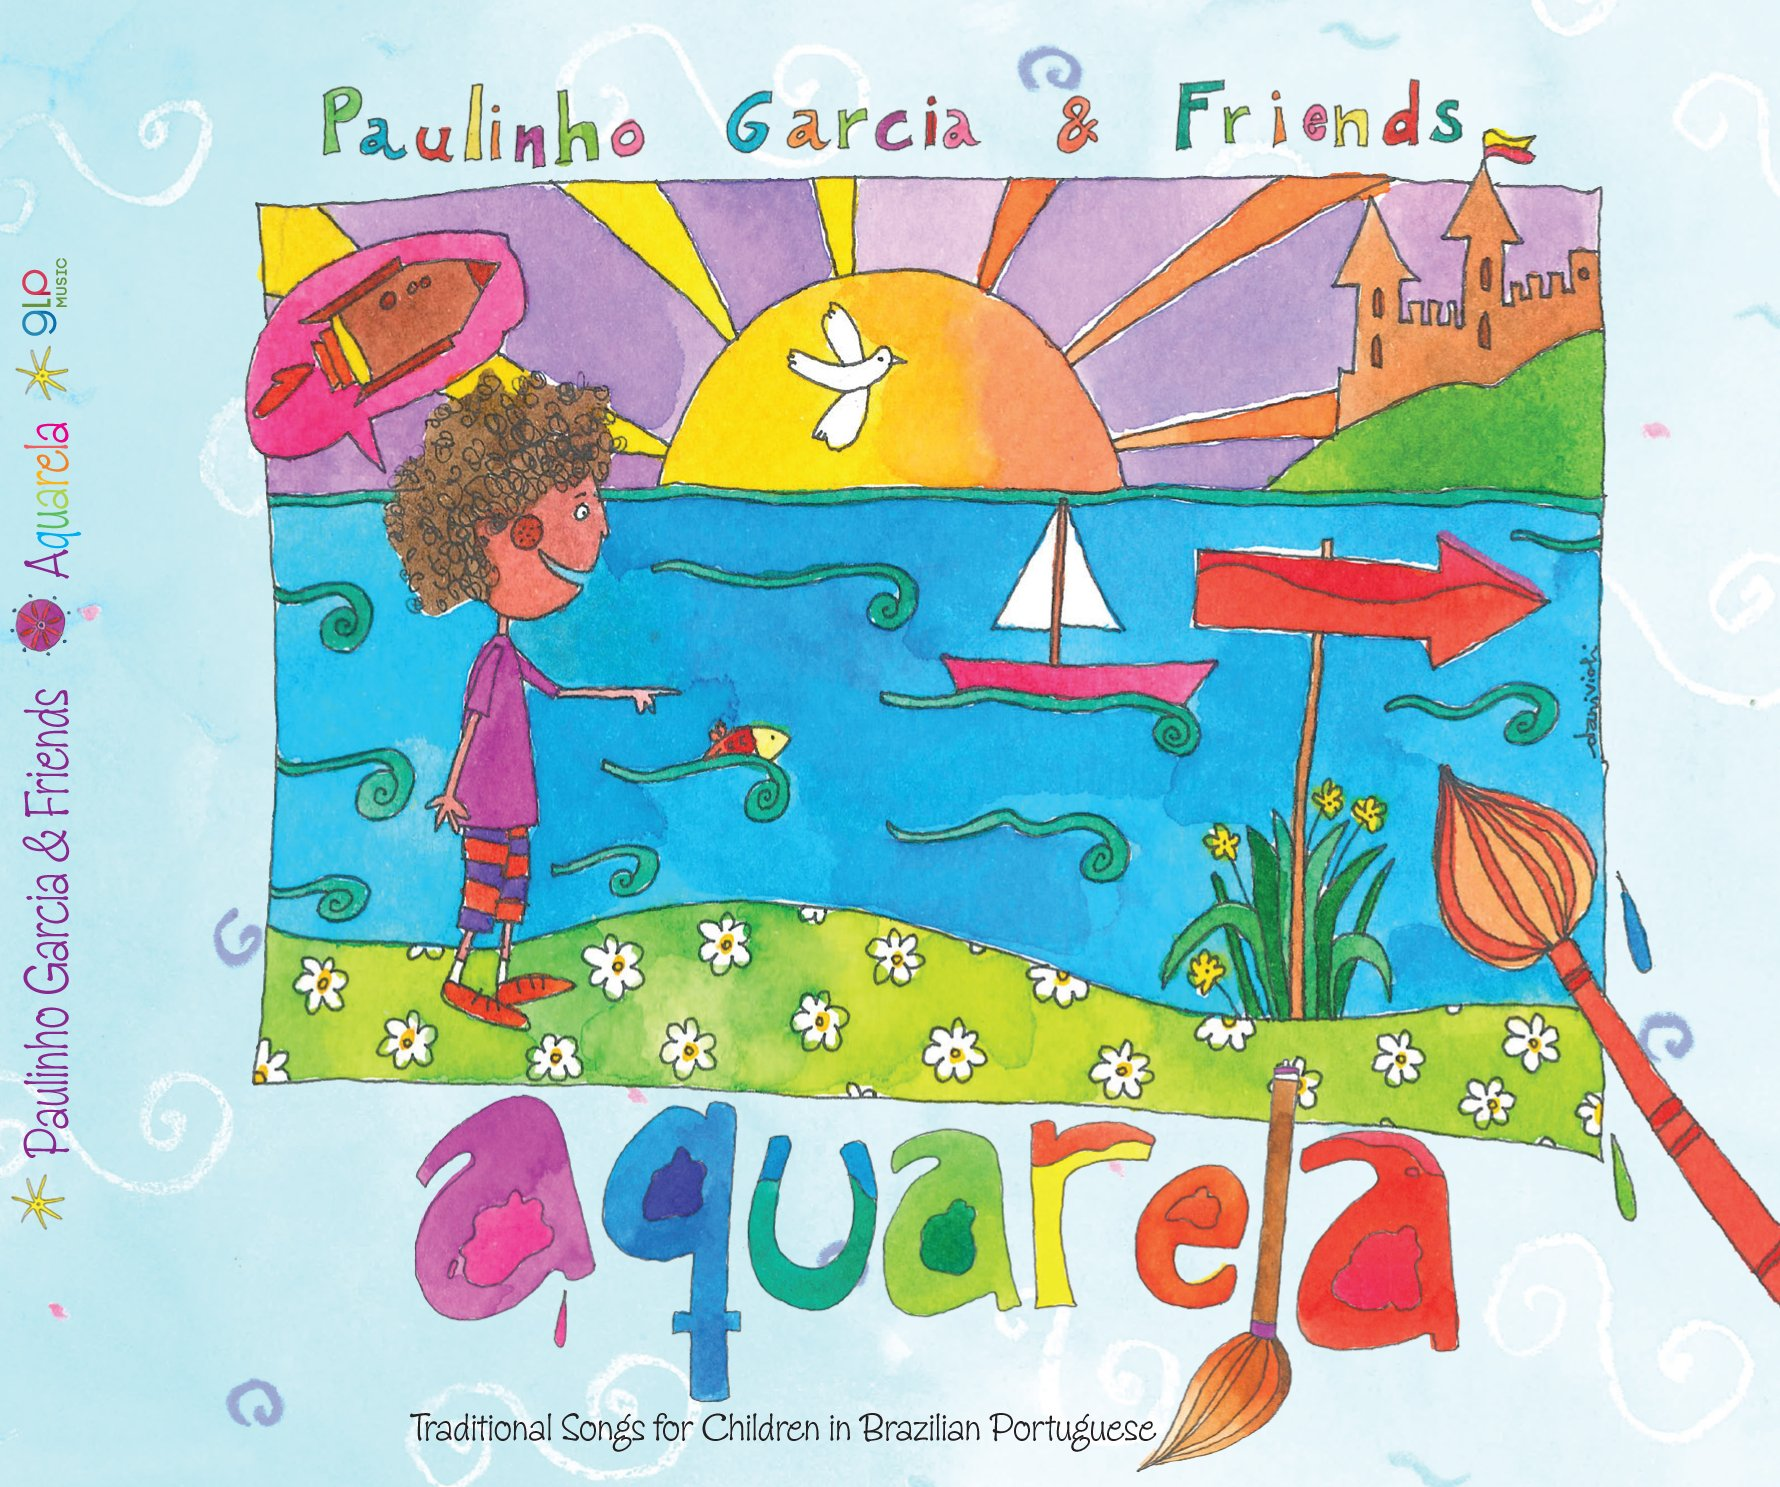 Aquarela - Traditional Songs for Children in Brazilian Portuguese